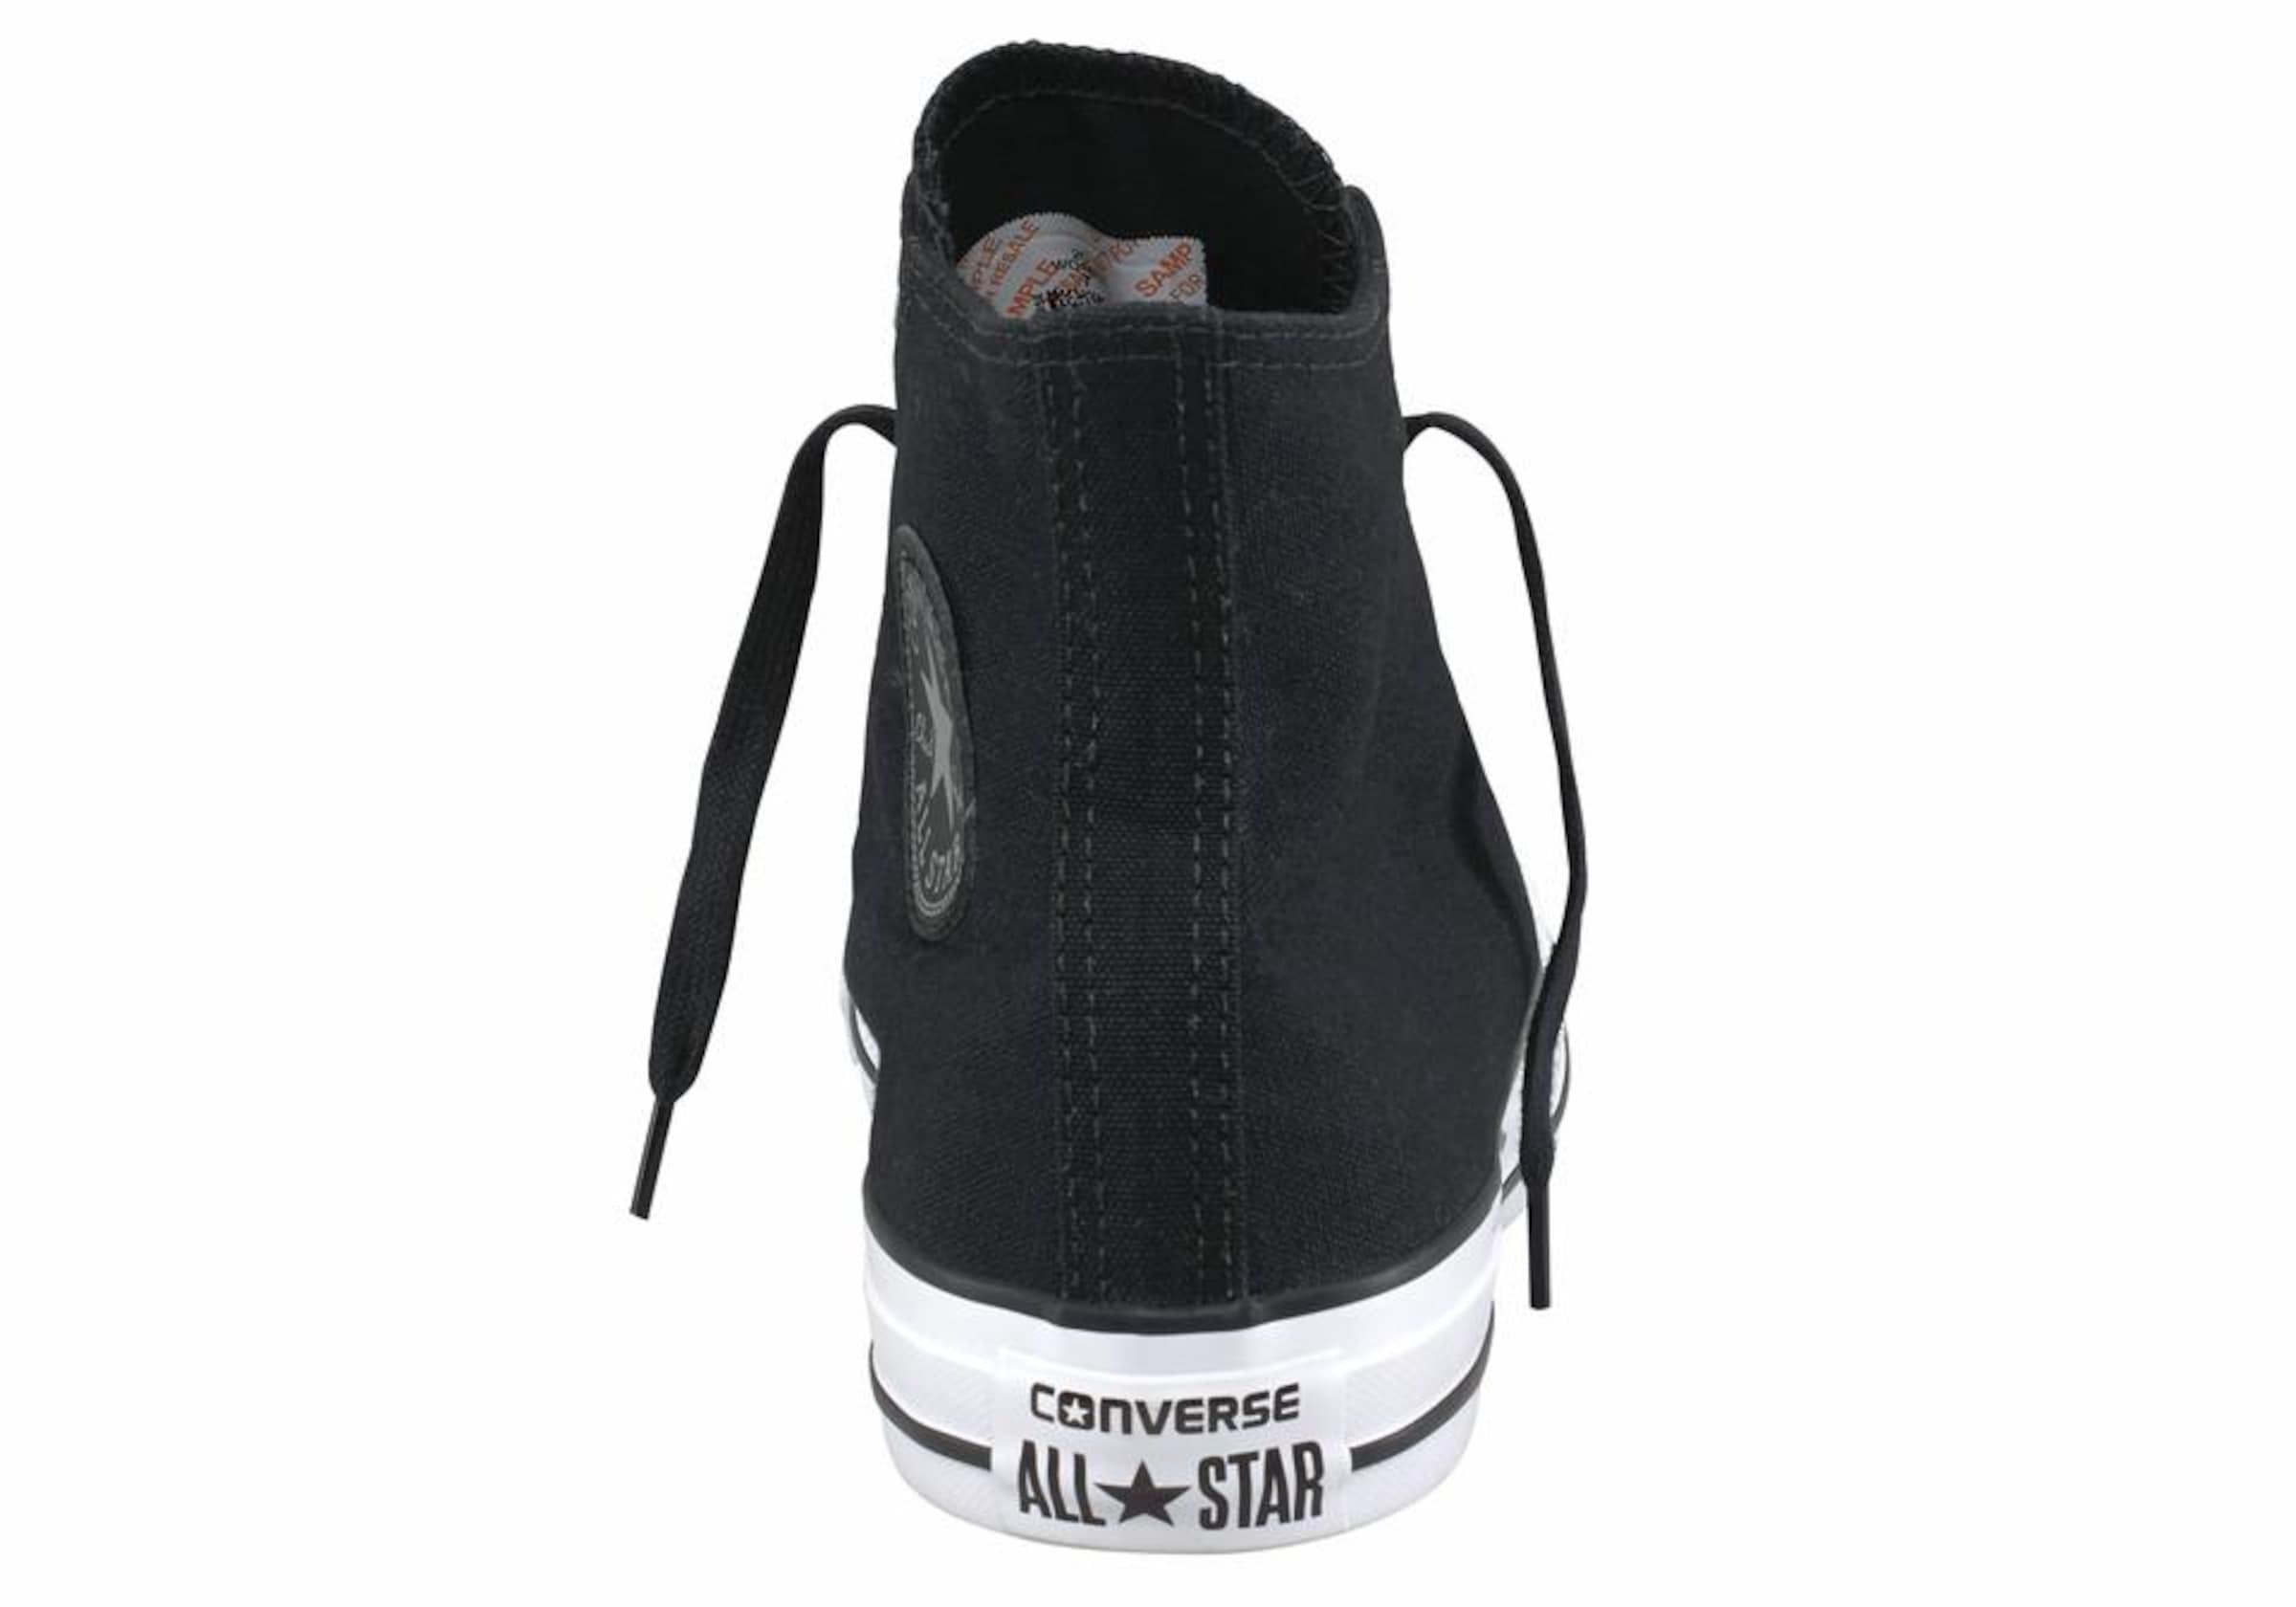 CONVERSE Sneaker 'Chuck Taylor All Star Metallic Toecap Hi' Verkauf Wählen Eine Beste Spielraum Fabrikverkauf Neuankömmling o10pLXUn